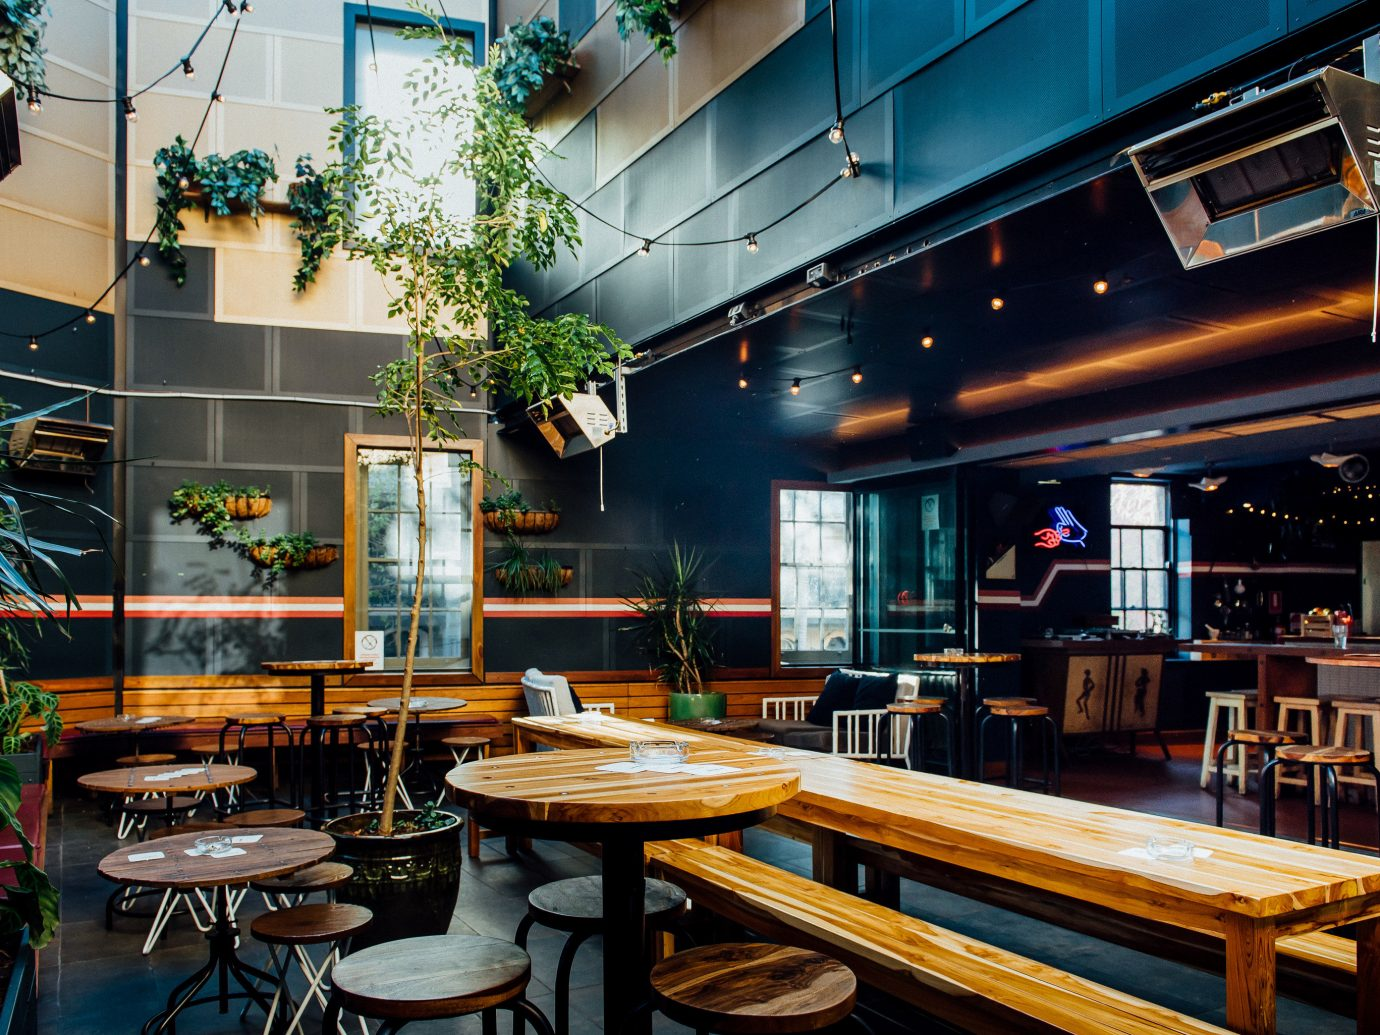 Budget table indoor room restaurant interior design Bar estate Design